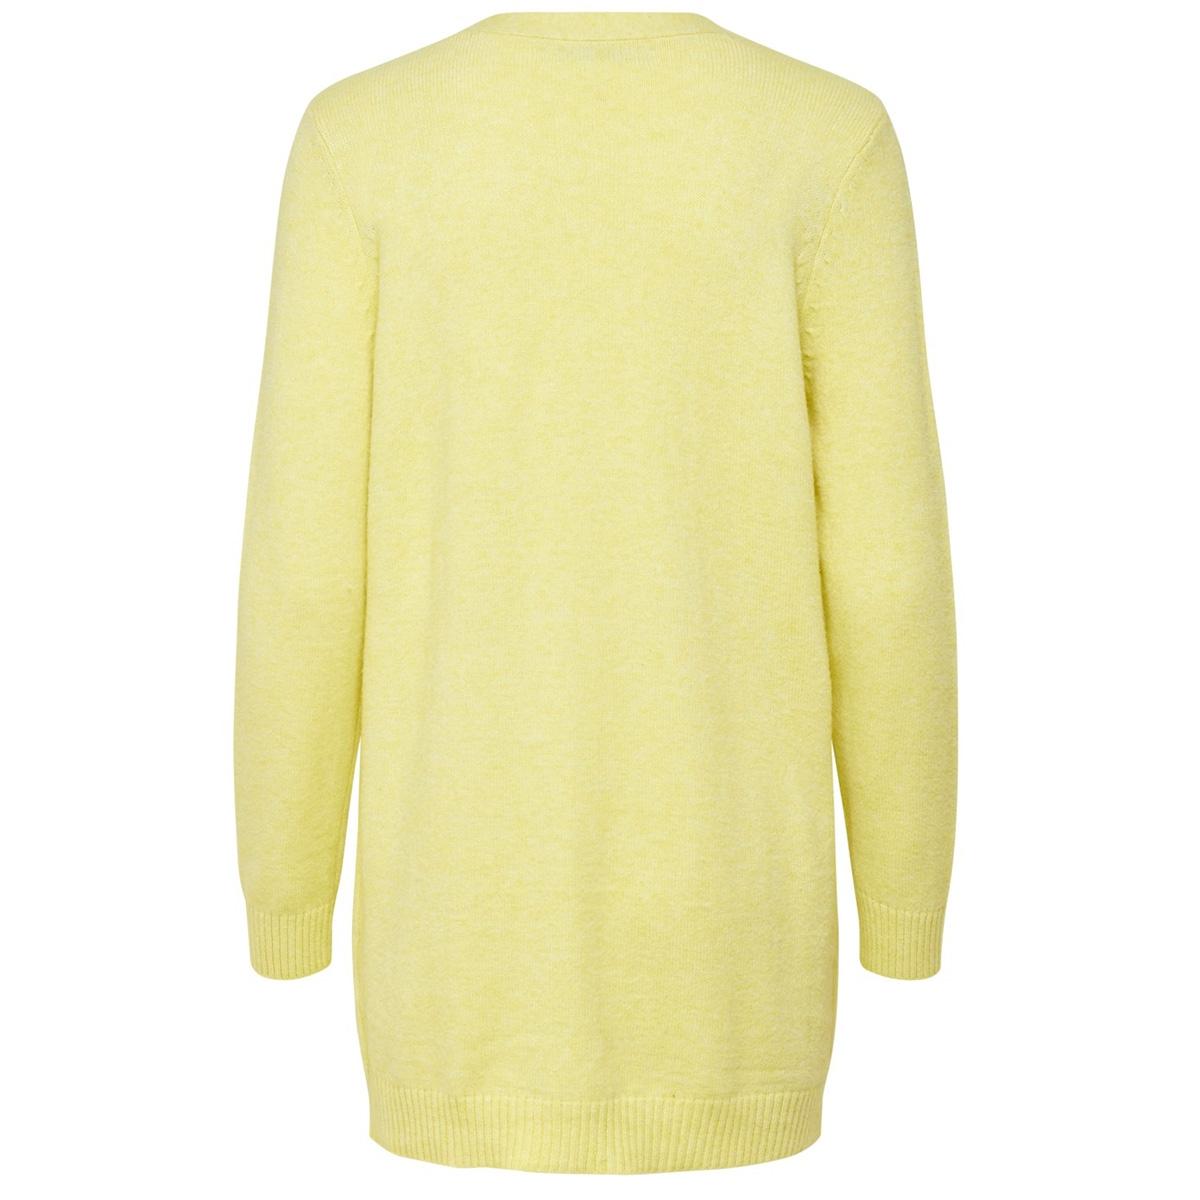 onllesly l/s open cardigan knt noos 15174274 only vest elfin yellow/w. melange